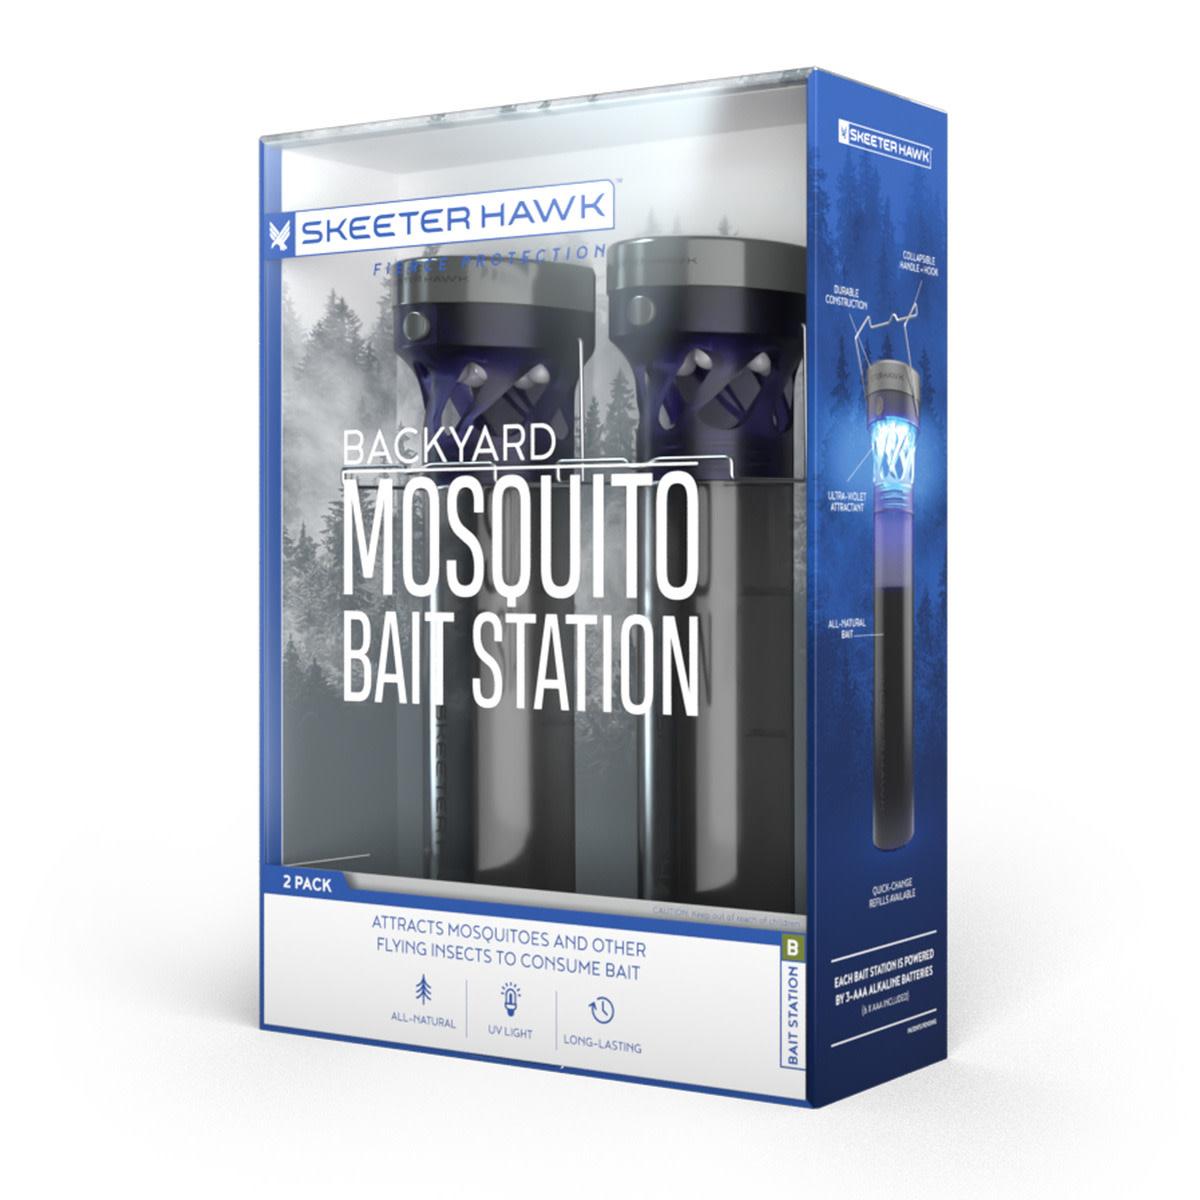 Skeeter Hawk Backyard Mosquito Bait Station